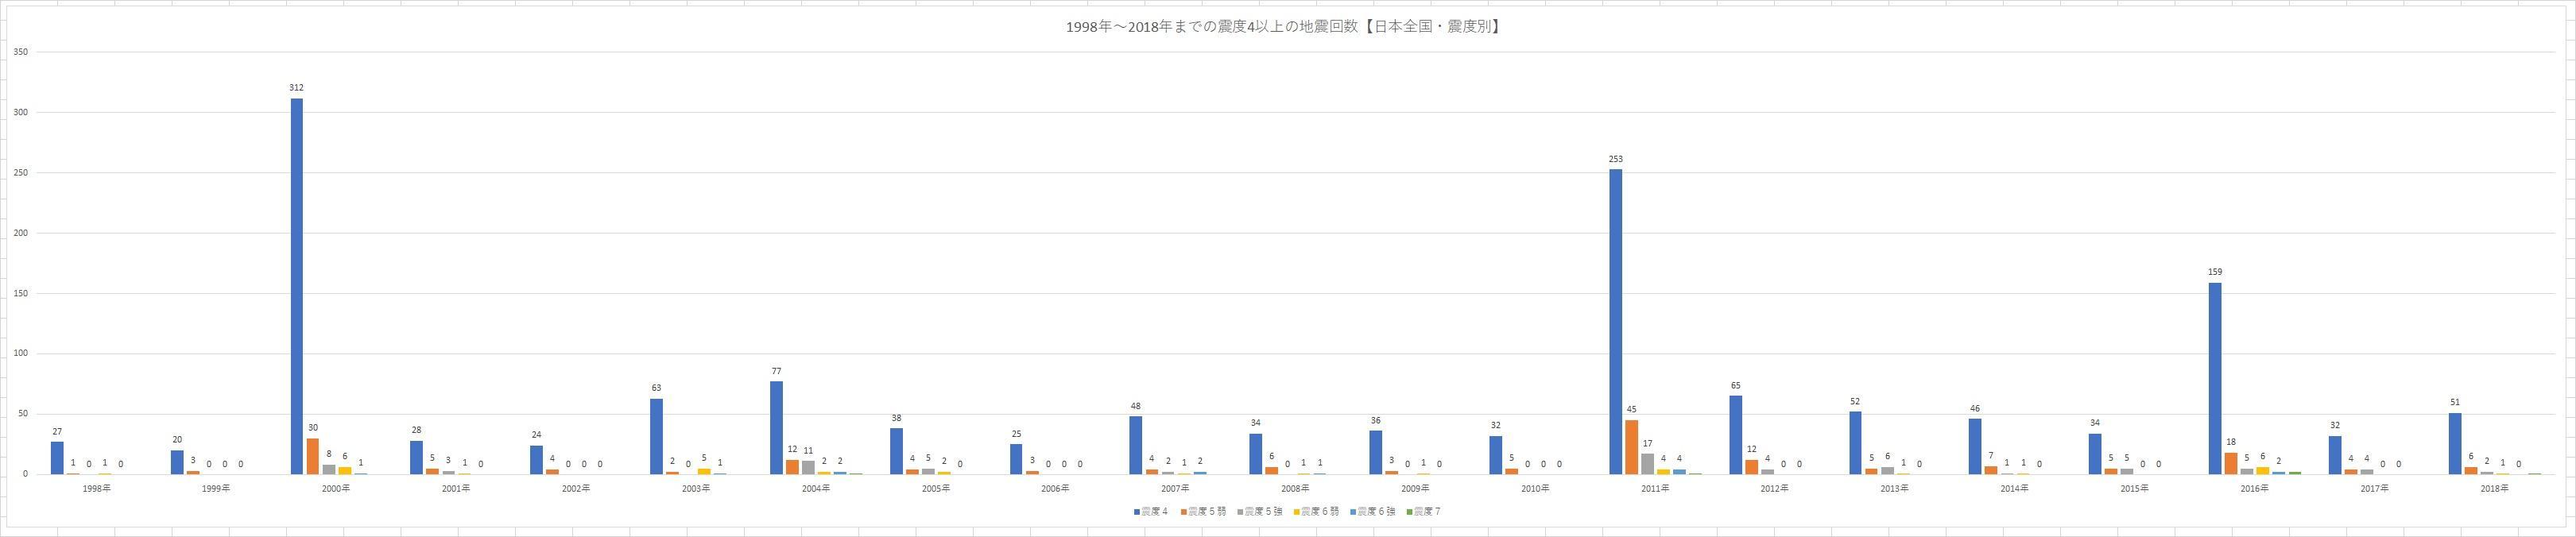 http://tablo.jp/case/img/graph_01-b.jpg